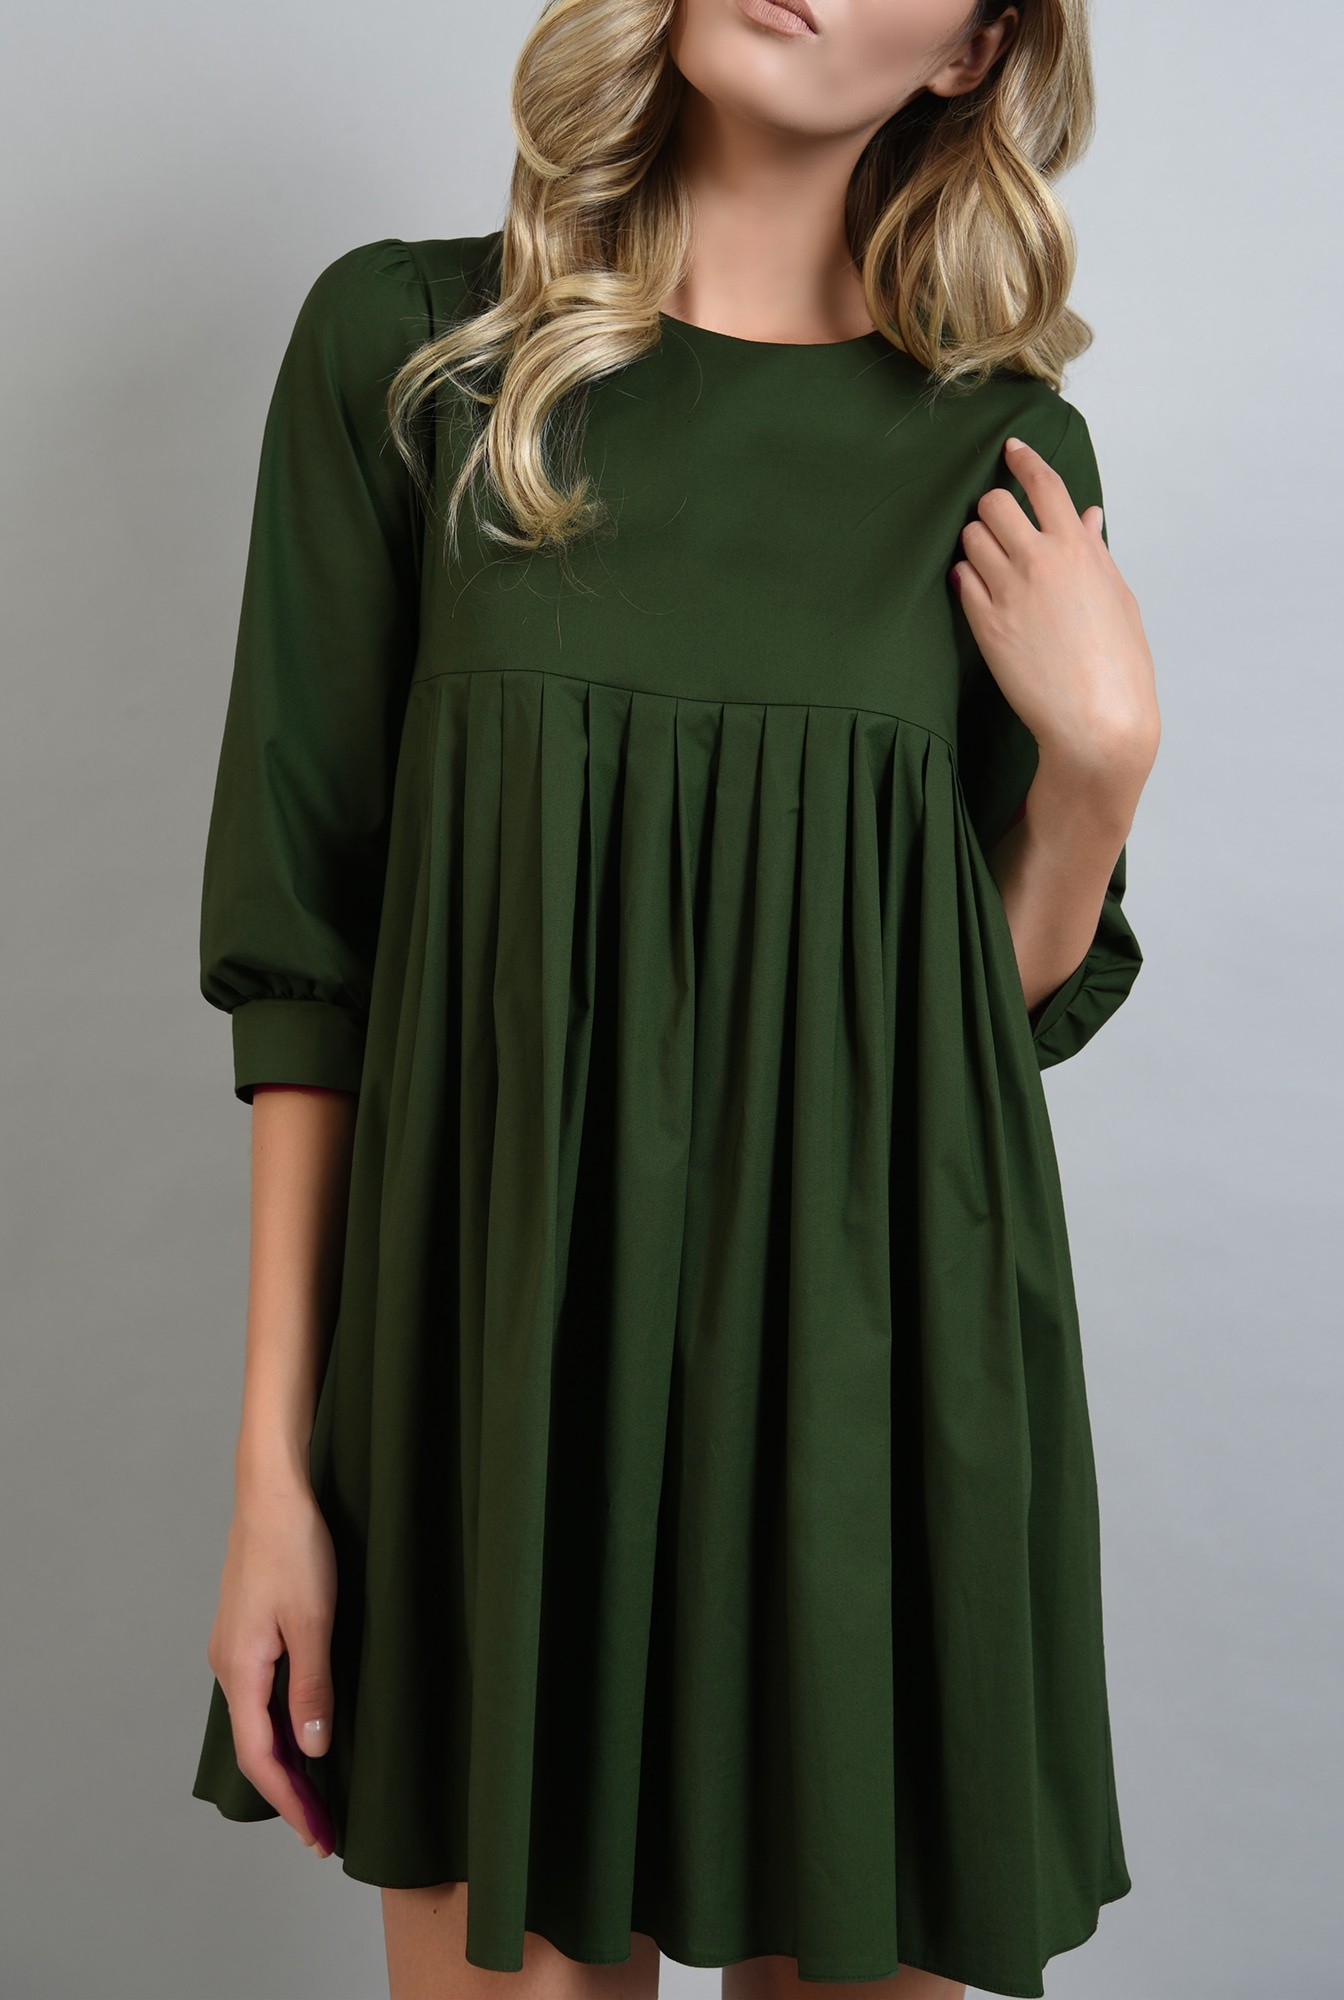 2 - rochie verde scurta, cu pliuri, Poema